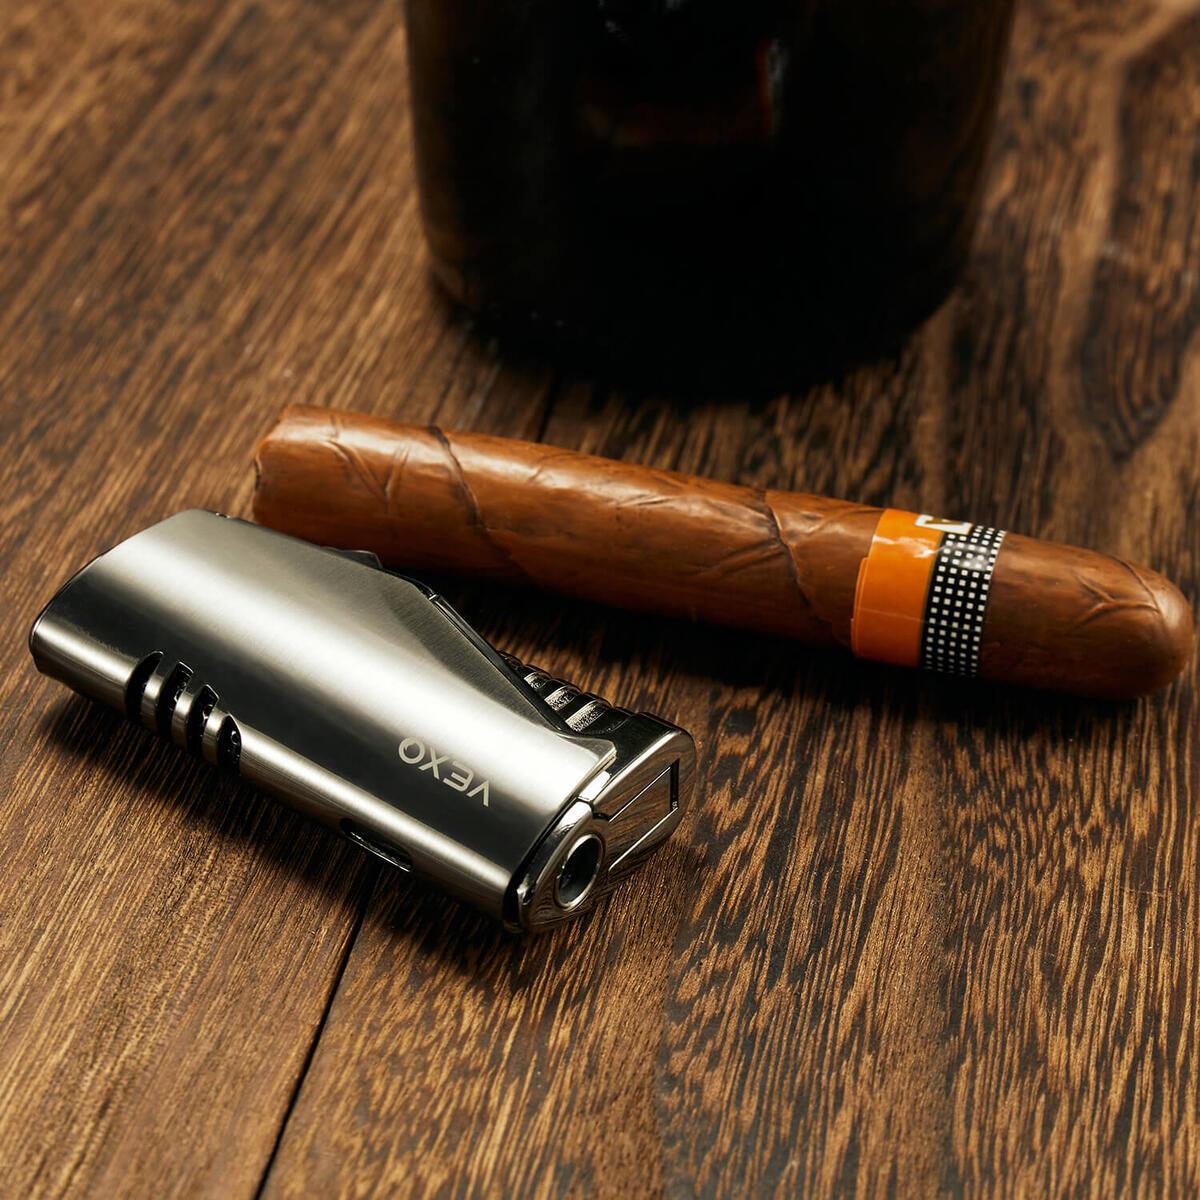 Cigar Lighter, Refillable Butane Lighter Adjustable Flame with Cigar Punch (Butane NOT Included) (Black Nickel)